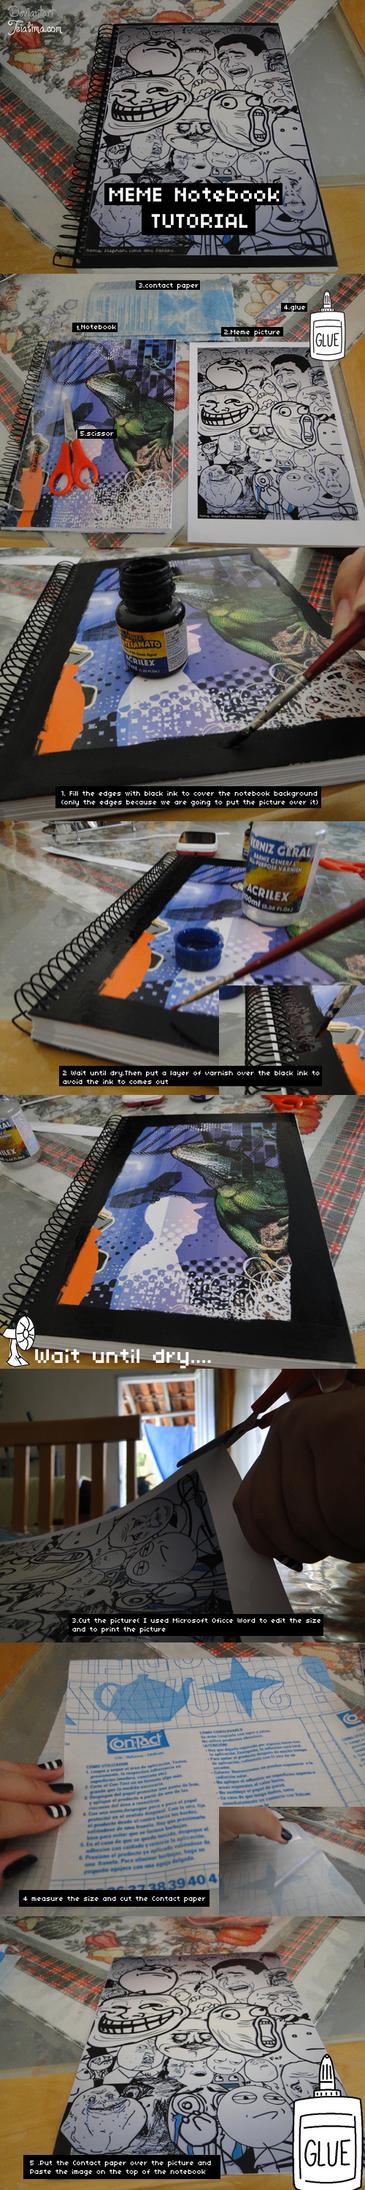 Meme Notebook Tutorial by teialima